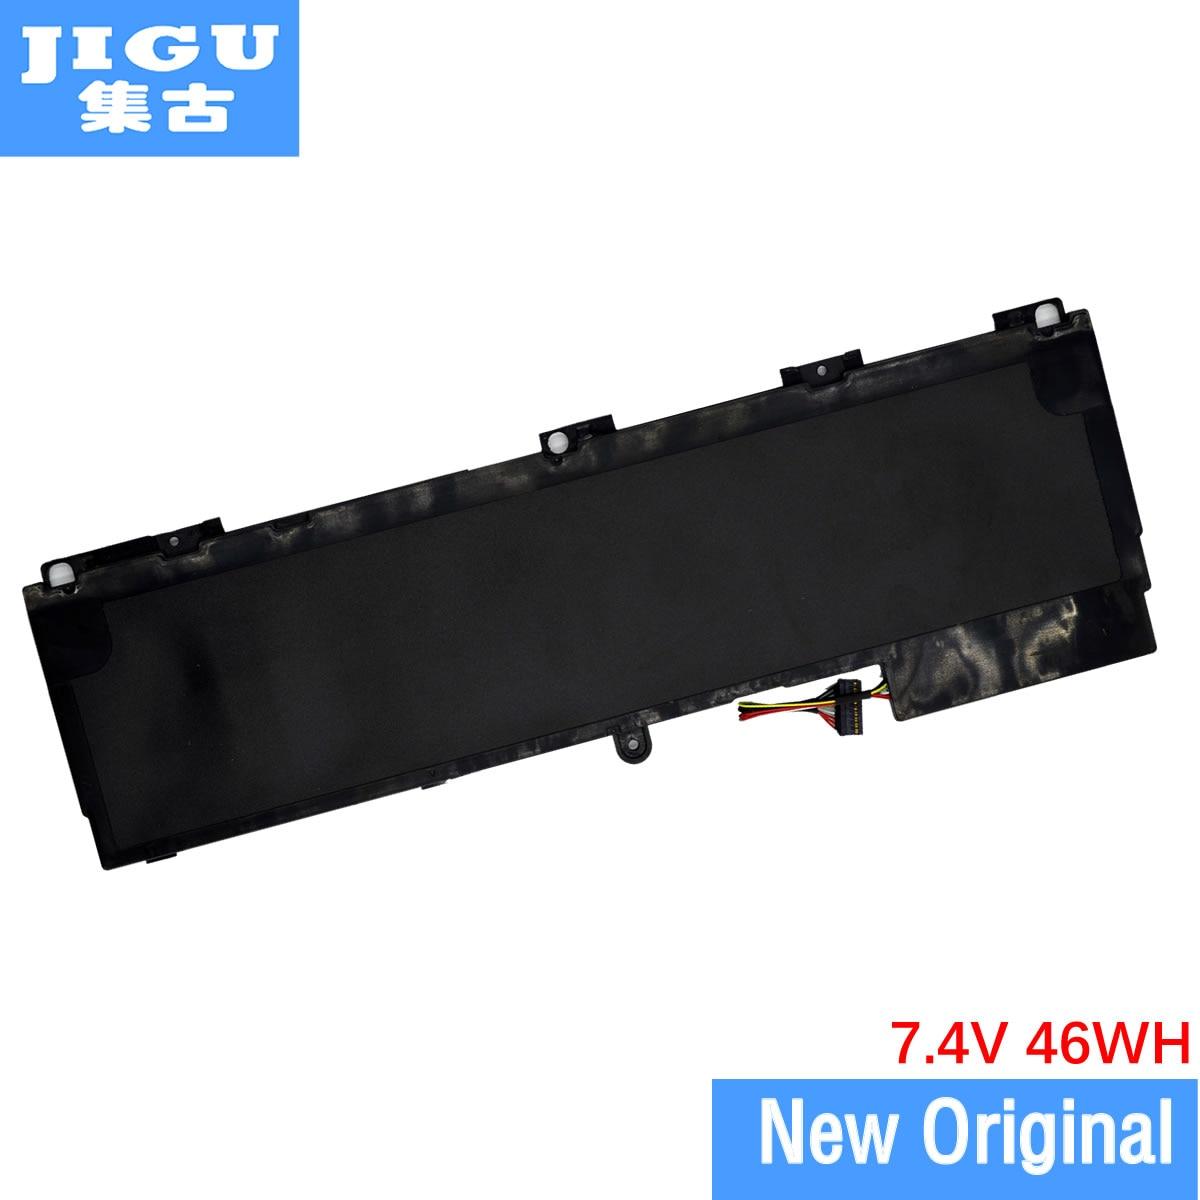 JIGU AAPLAN6AR AA-PLAN6AR Original Laptop Battery For SAMSUNG 900X1AA01US 900X3A-01IT B04CH NP900X3A 900X1BA03 SERIES original battery for n150bat 6 6 87 n150s 4u91 n150sd laptop battery li ion 11 1v 62wh